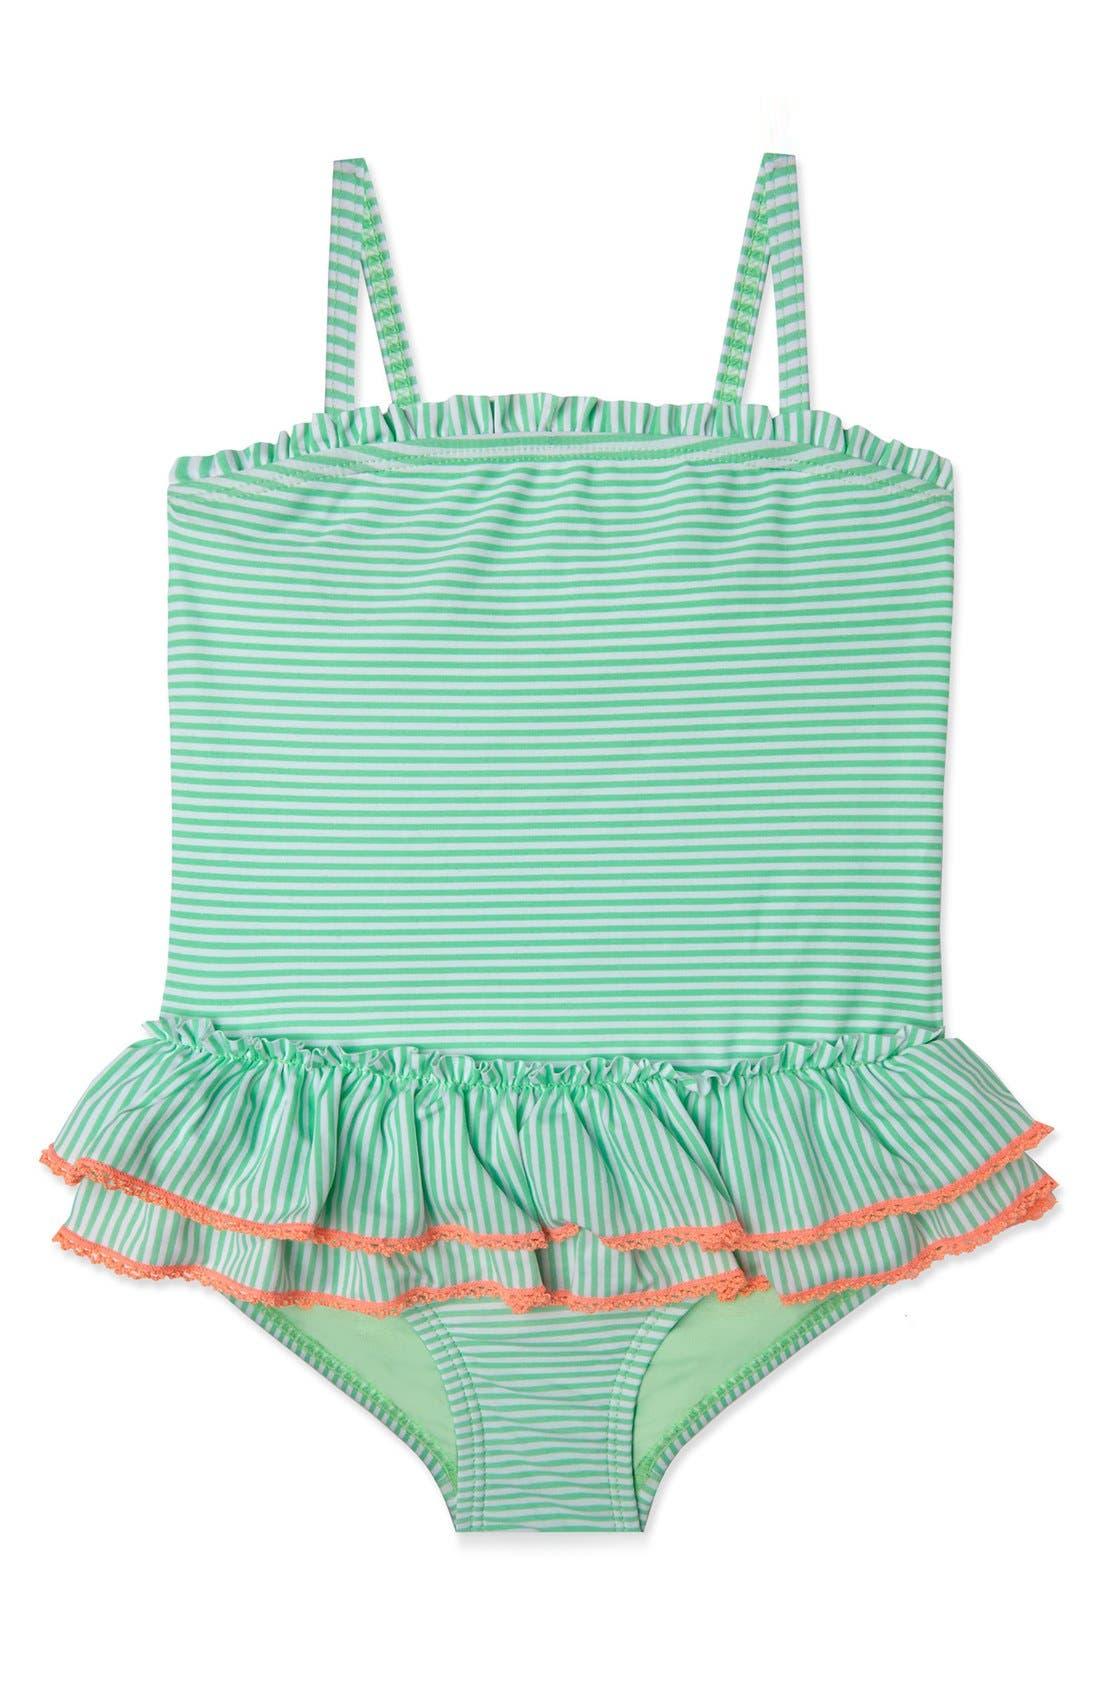 Alternate Image 1 Selected - Hula Star 'Sailor Stripe' One-Piece Swimsuit (Toddler Girls & Little Girls)